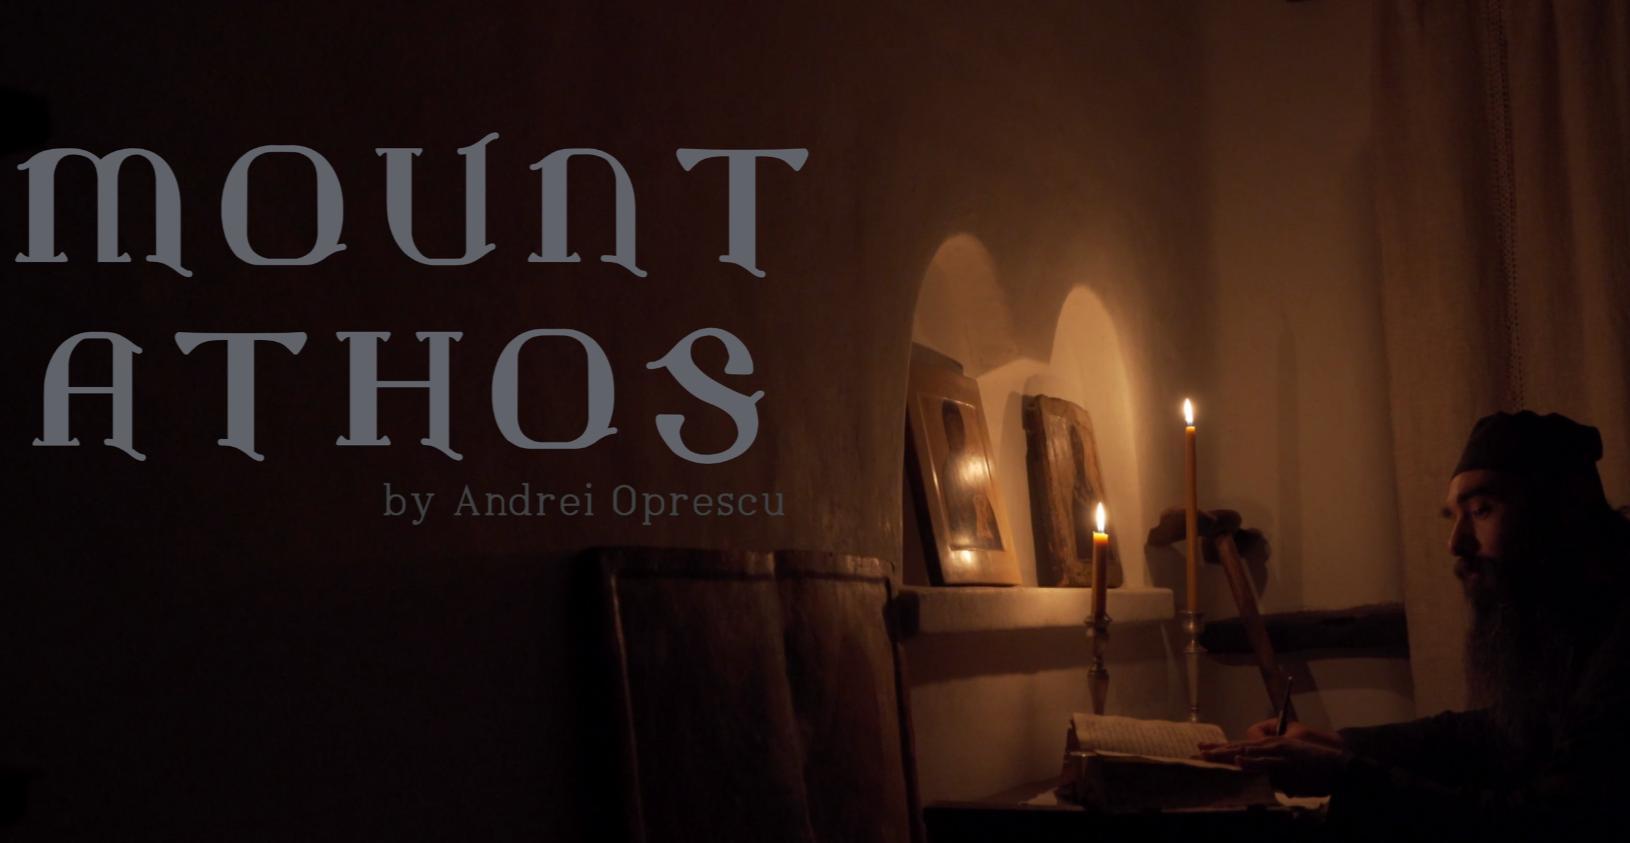 Mount Athos Documentary Film by Andrei Oprescu